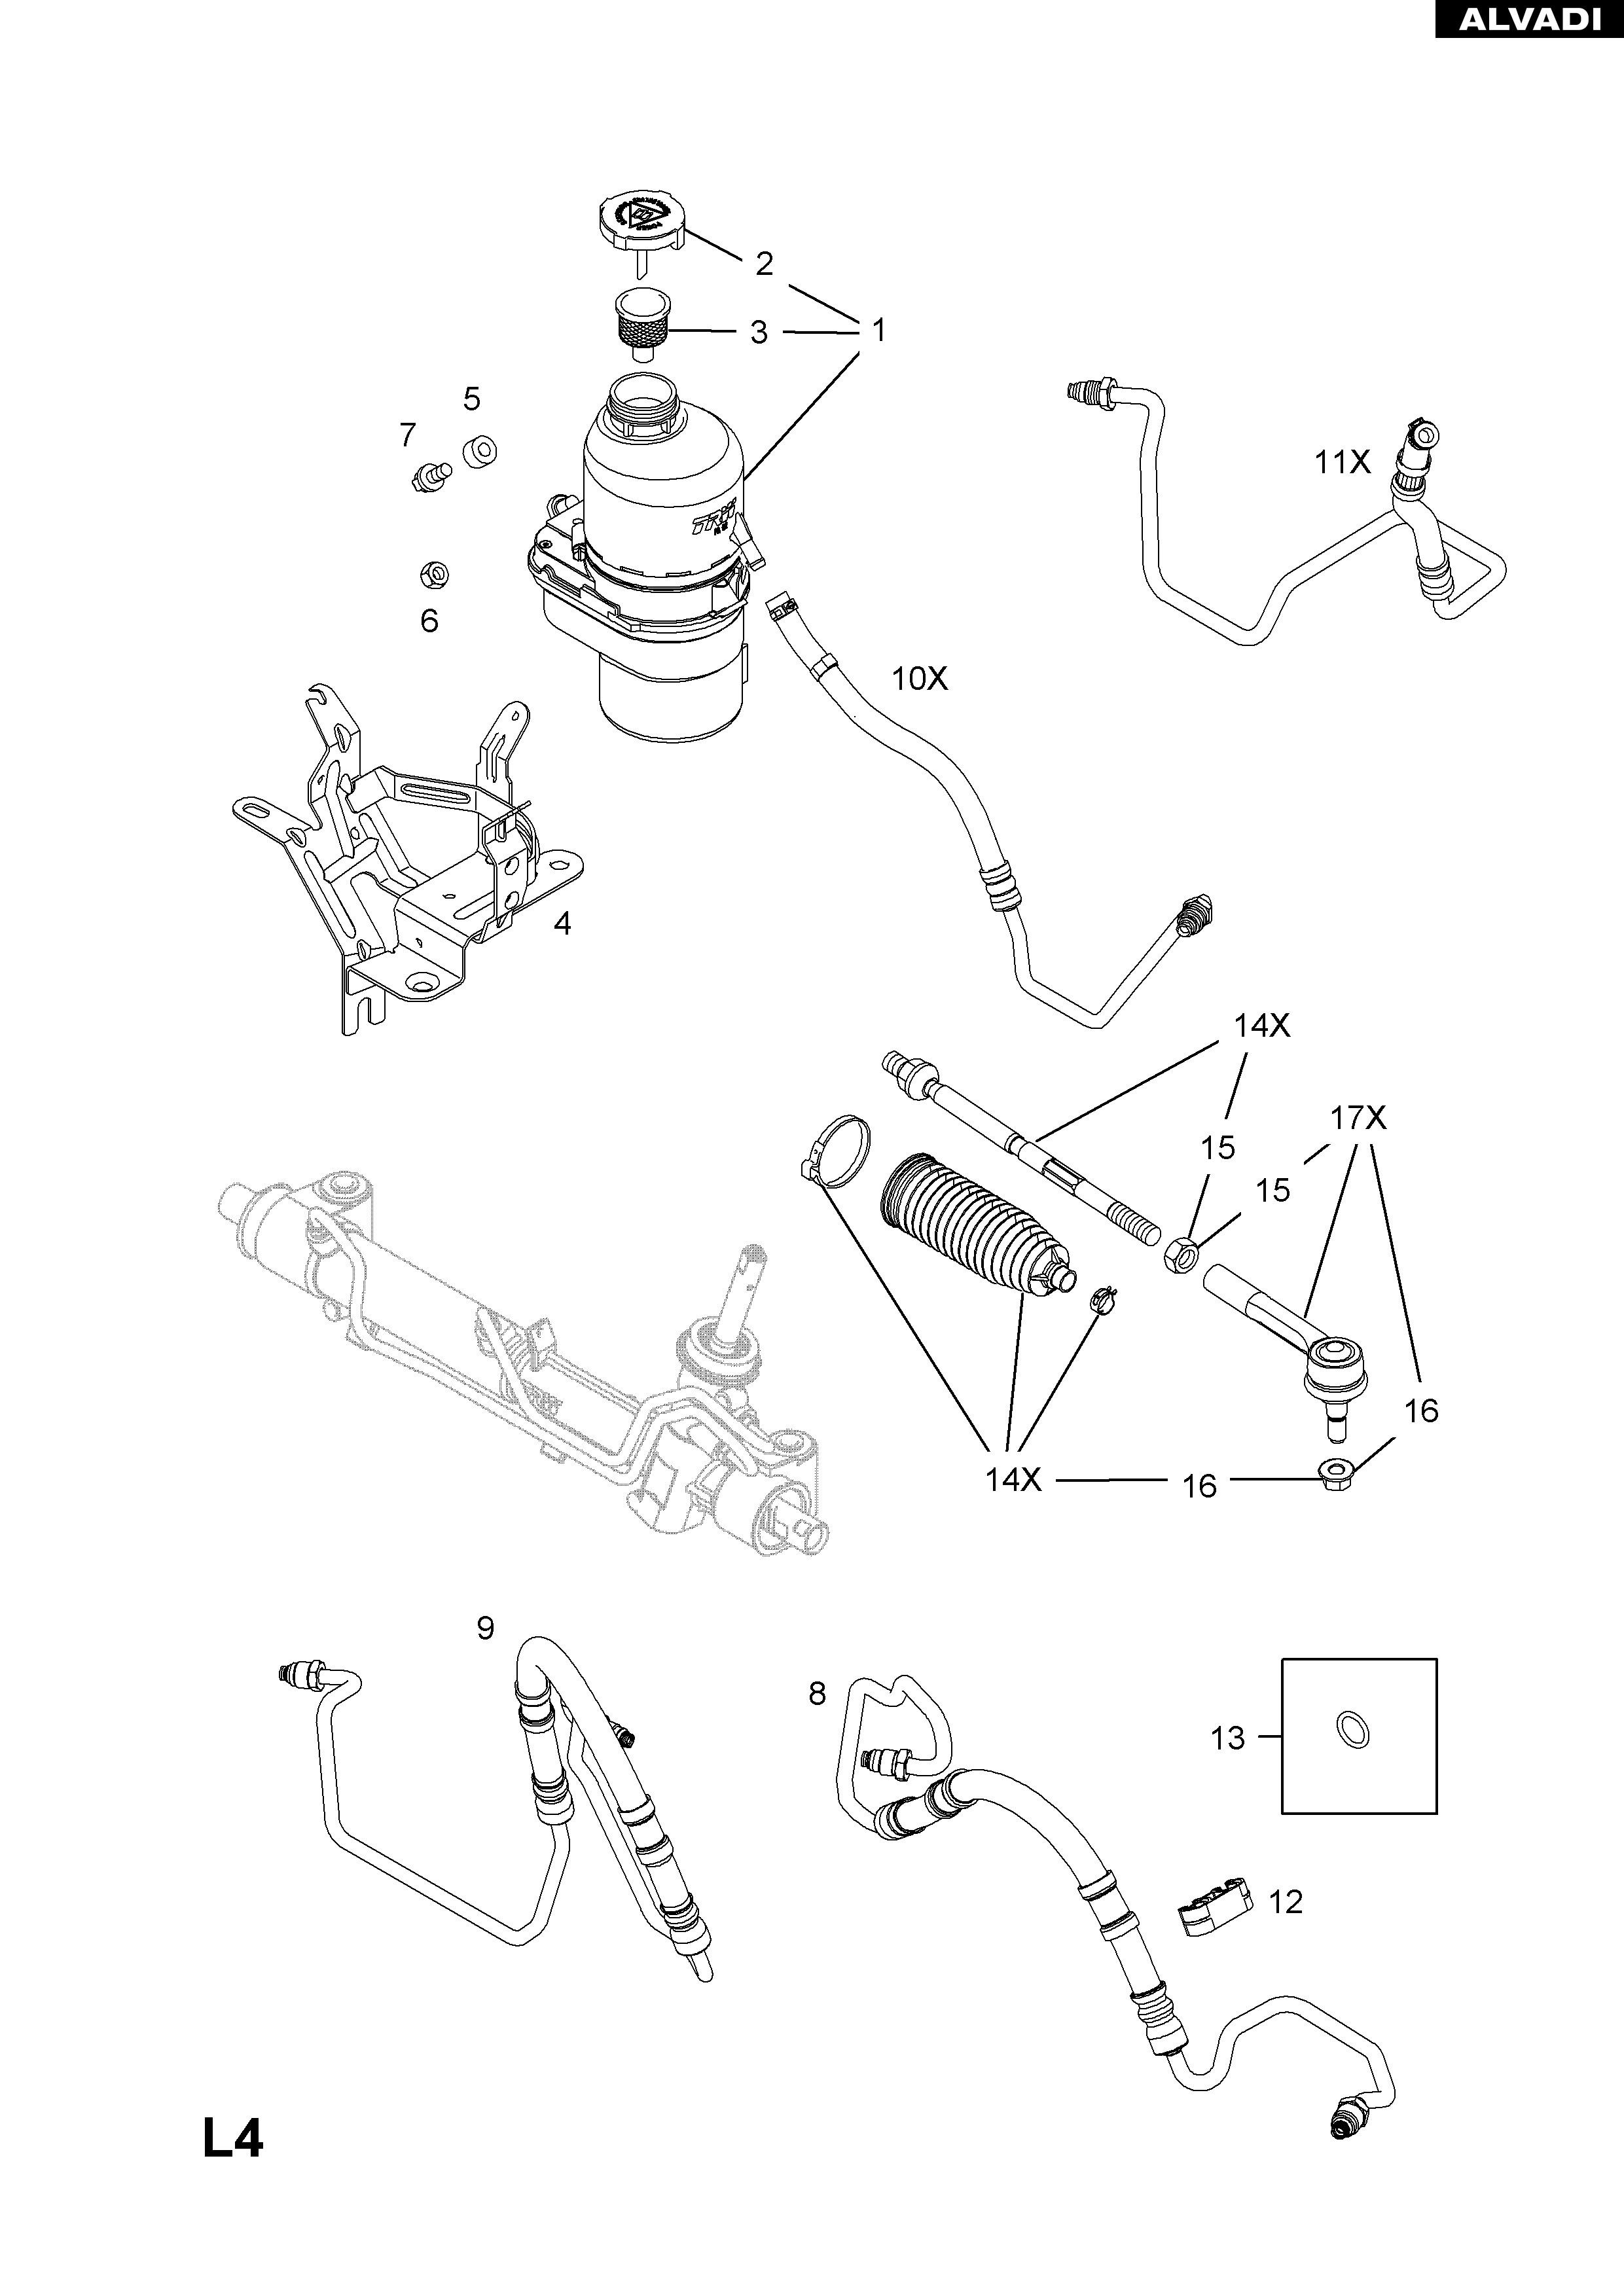 Power Steering System Diagram